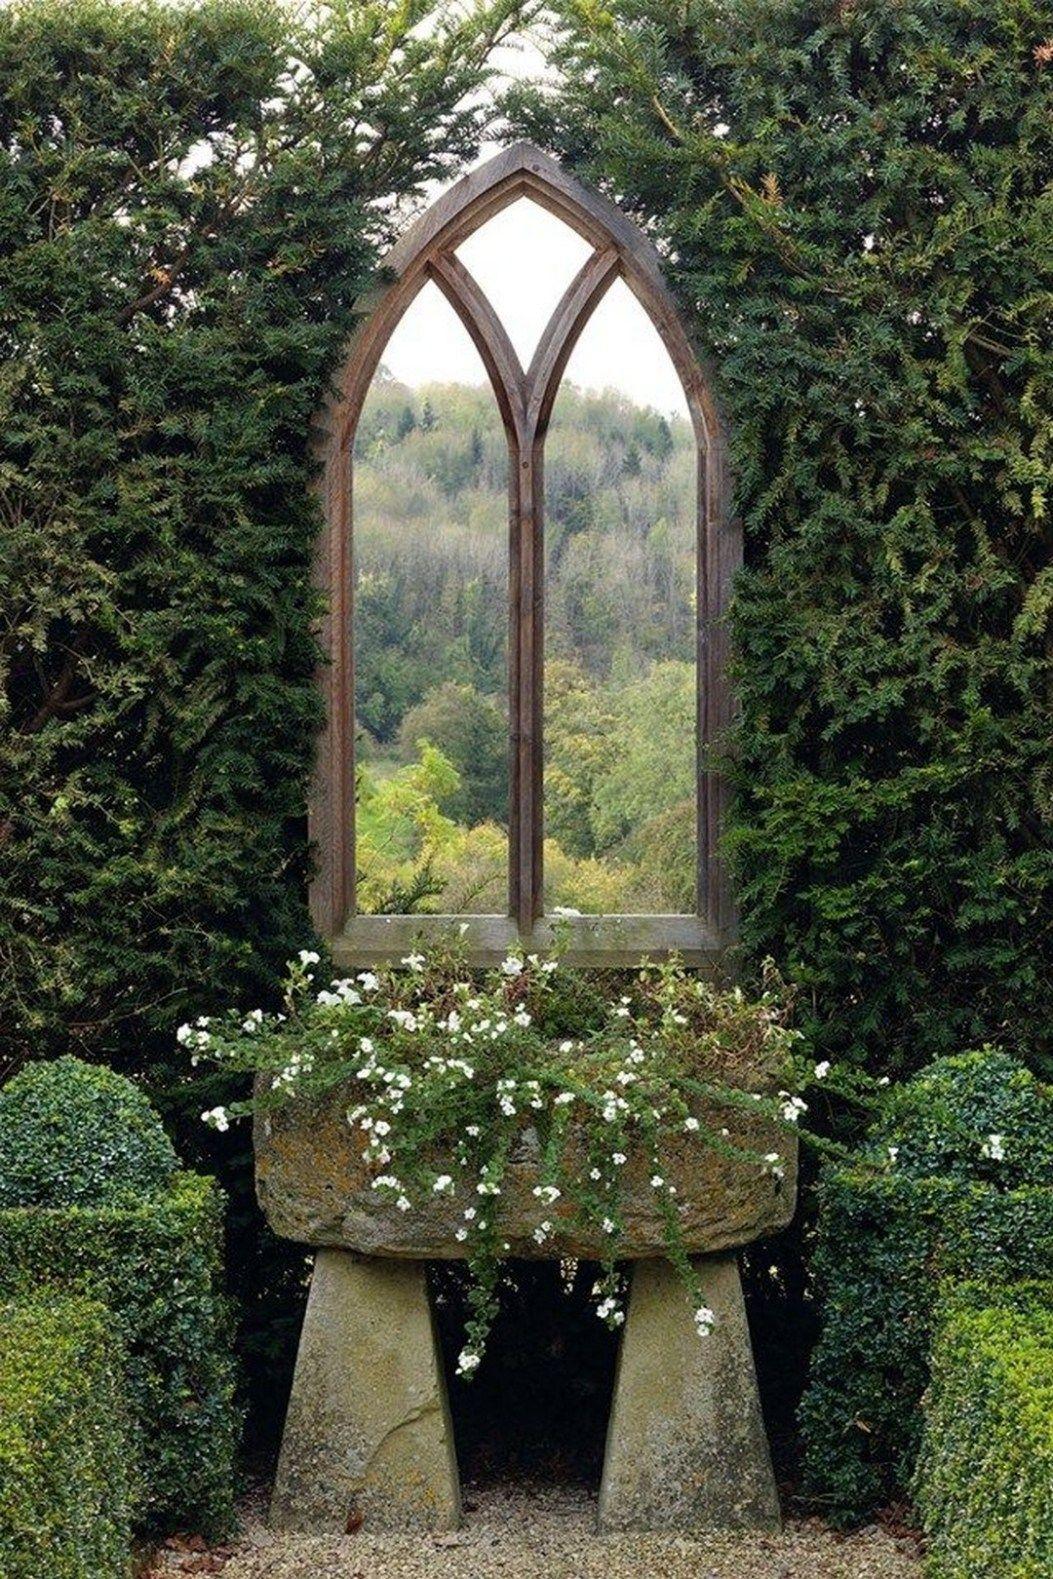 Best Diy Cottage Garden Ideas From Pinterest 12 Onechitecture Country Garden Decor Traditional Garden Design Country Cottage Garden